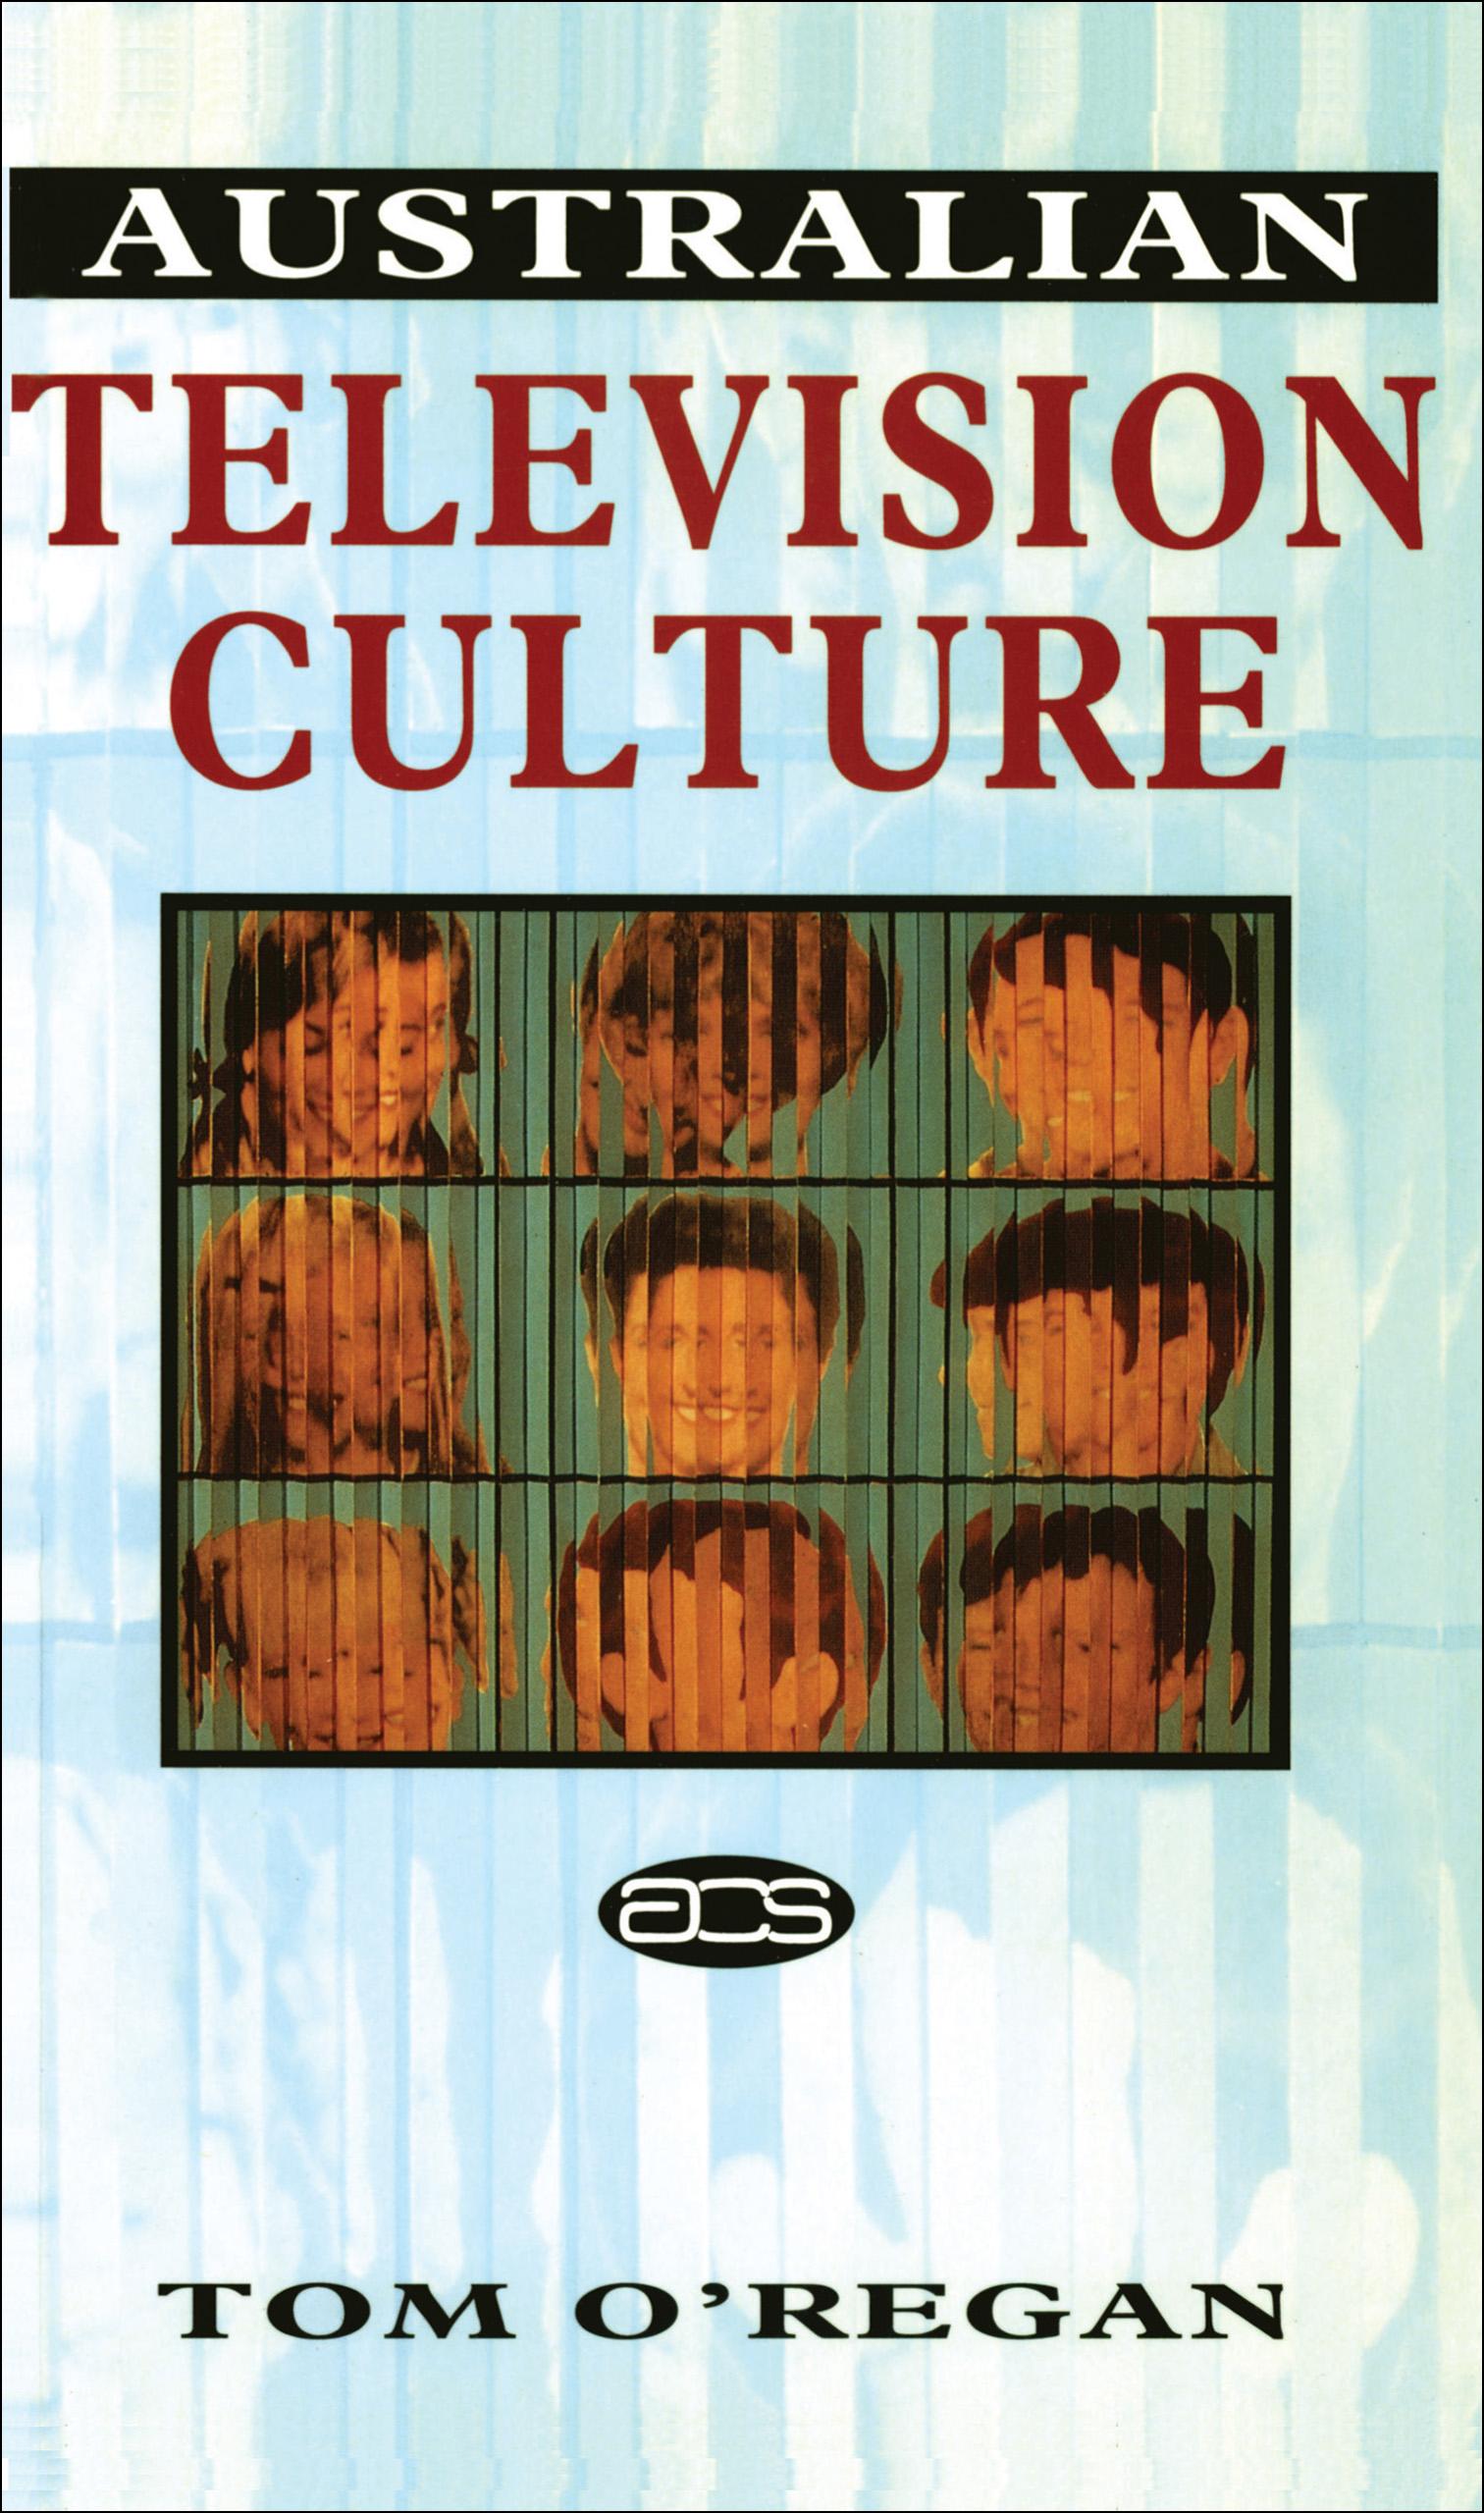 Download Ebook Australian Television Culture by Tom O'Regan Pdf